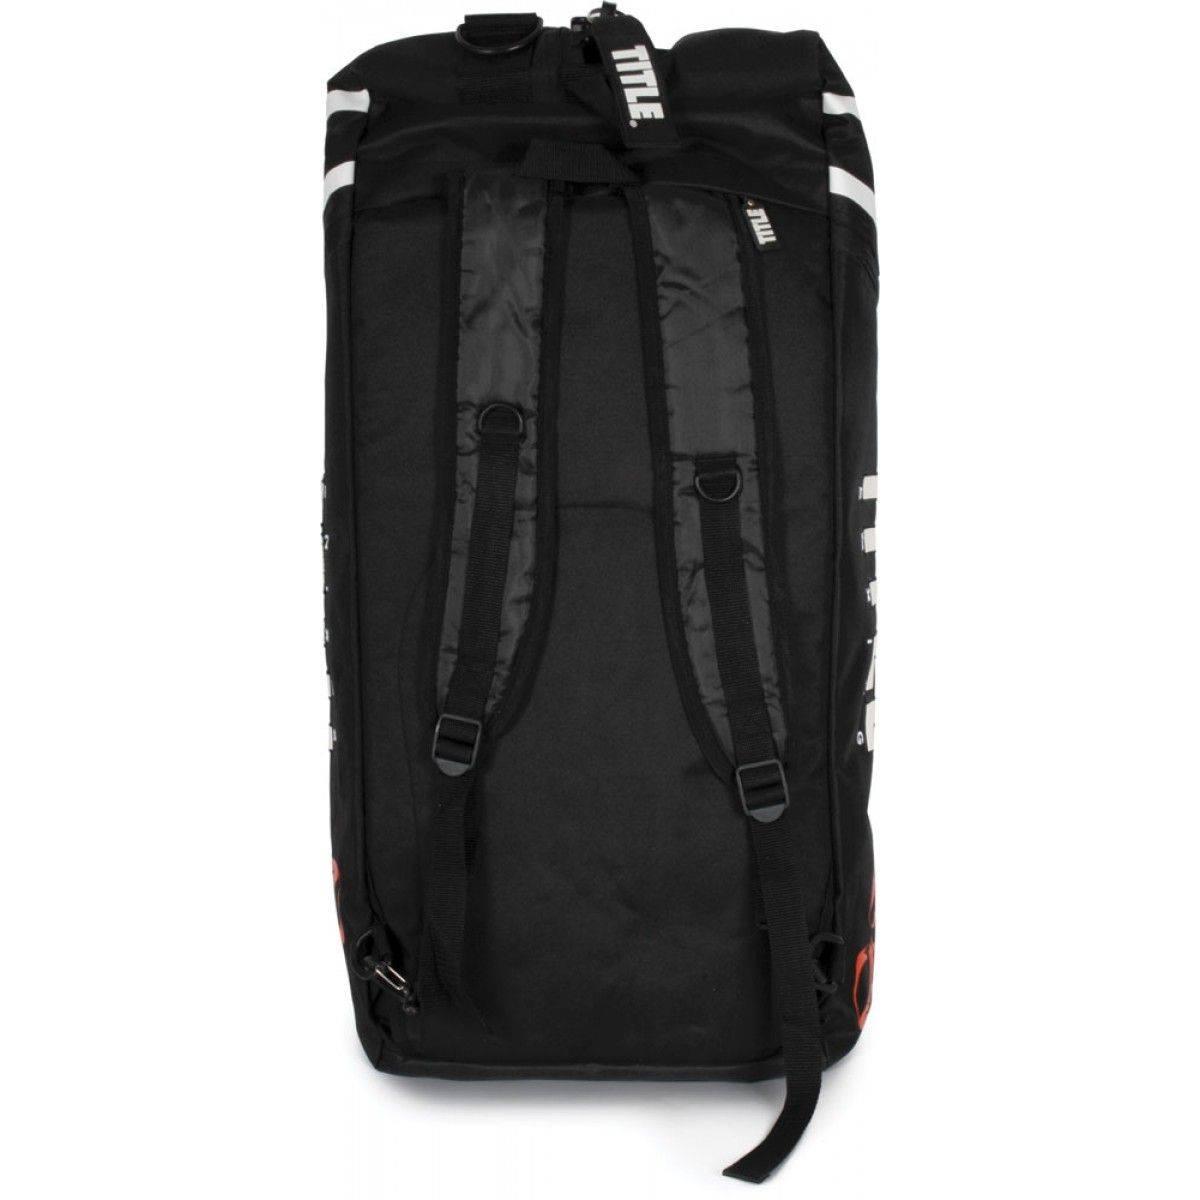 Сумка-рюкзак TITLE World Champion Sport Bag/Back Pack 2.0-черный